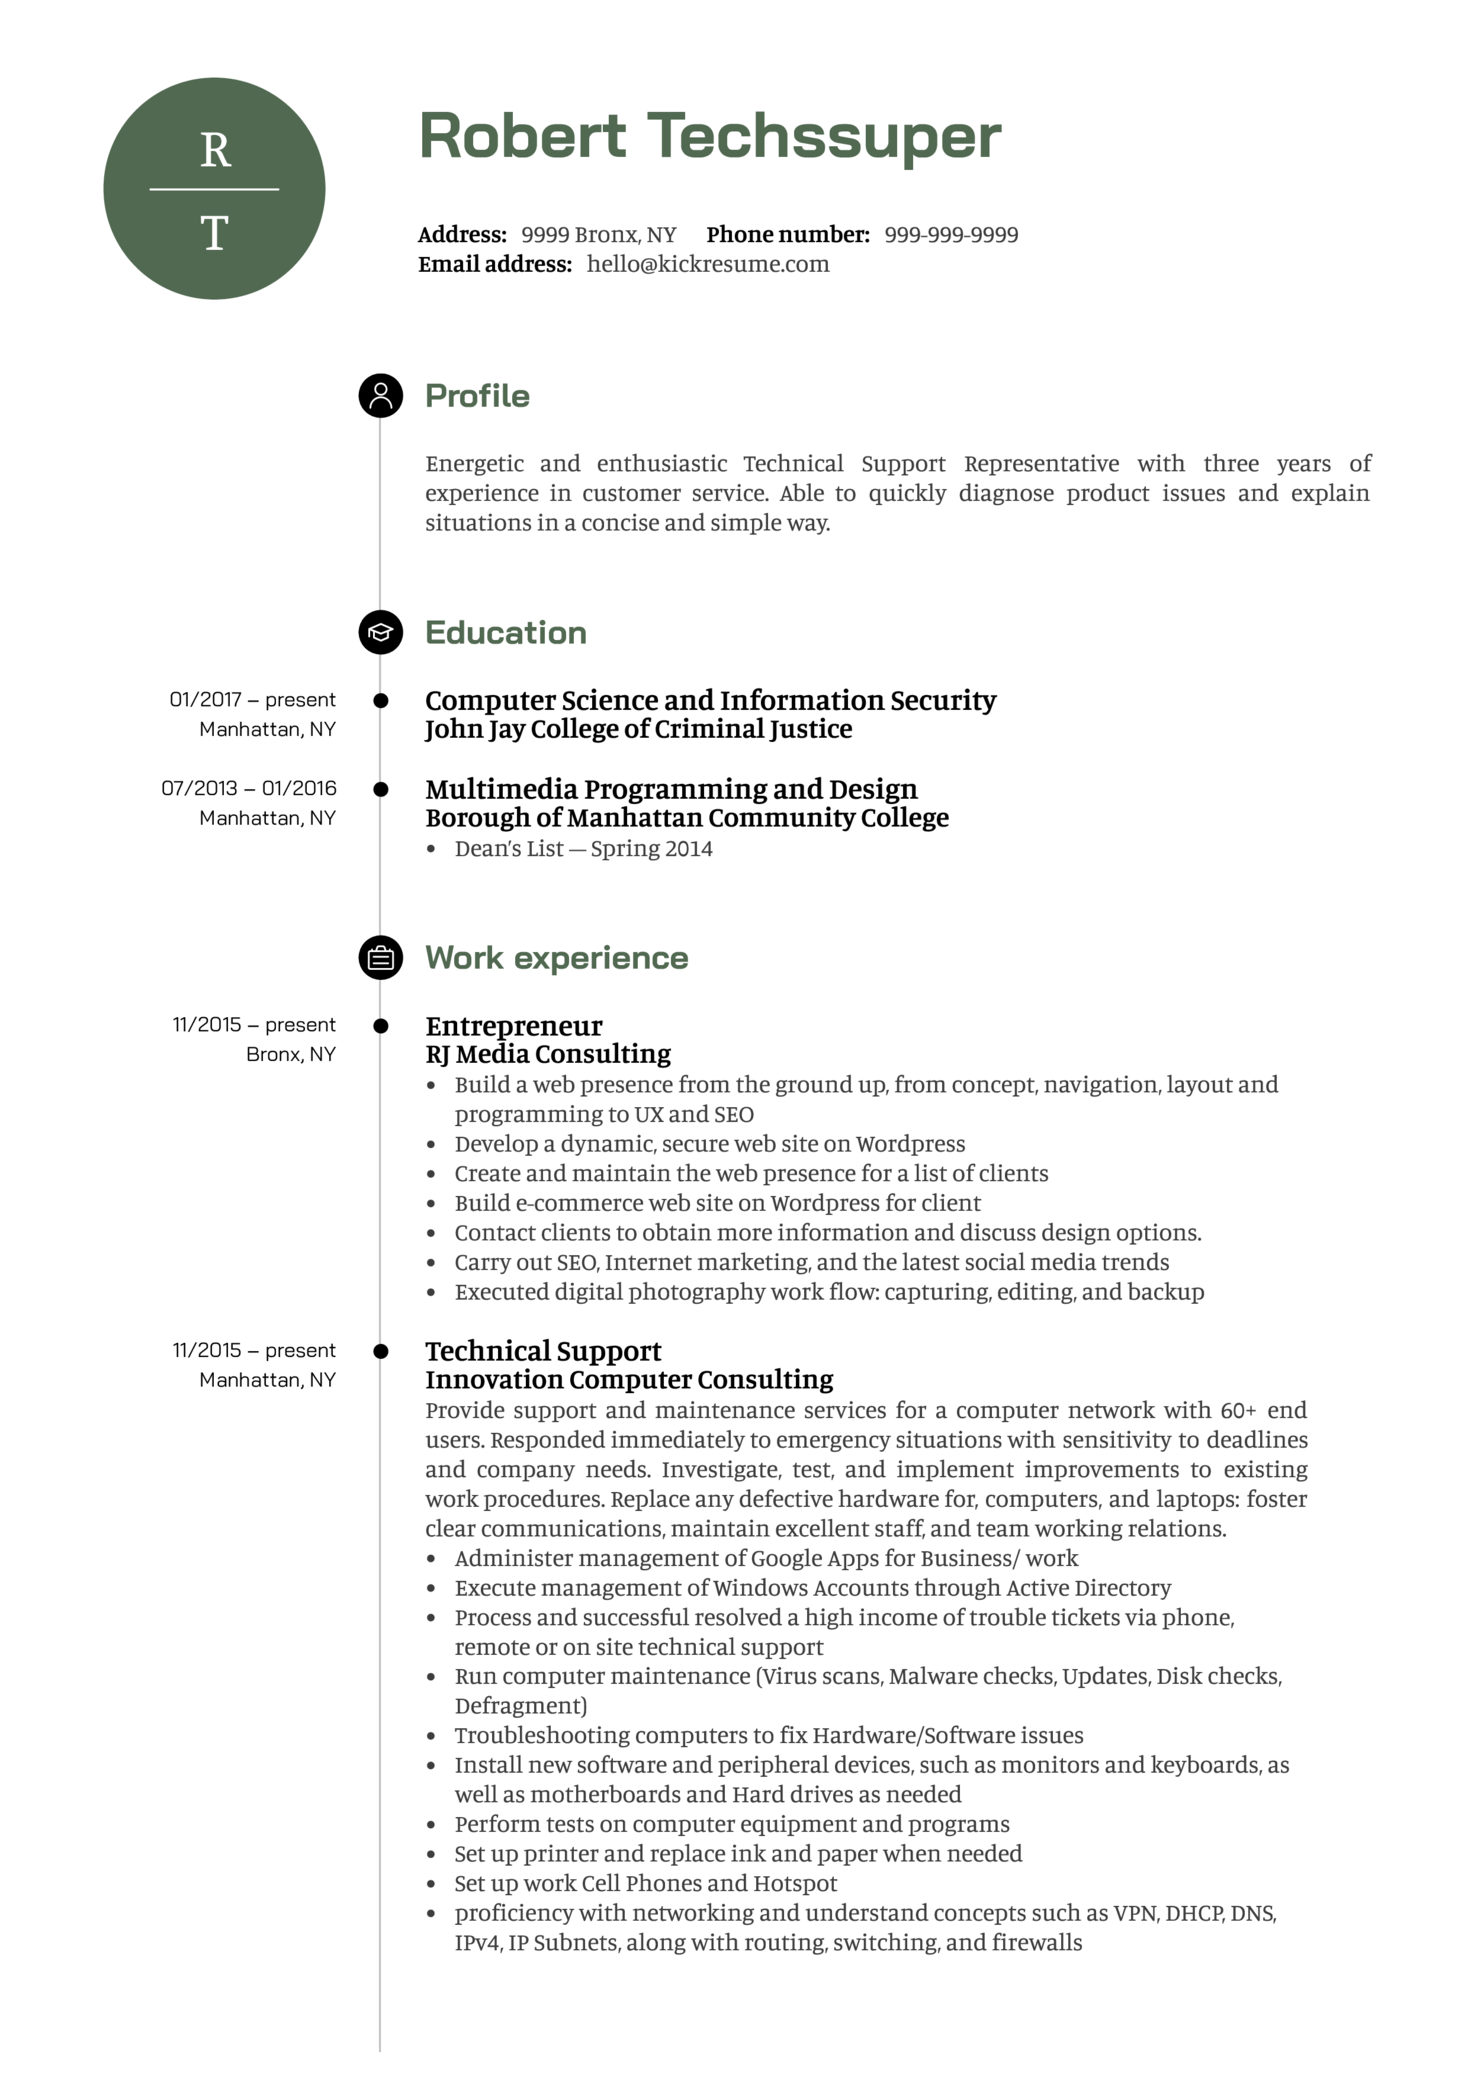 Technical Support Representative Resume Sample (parte 1)